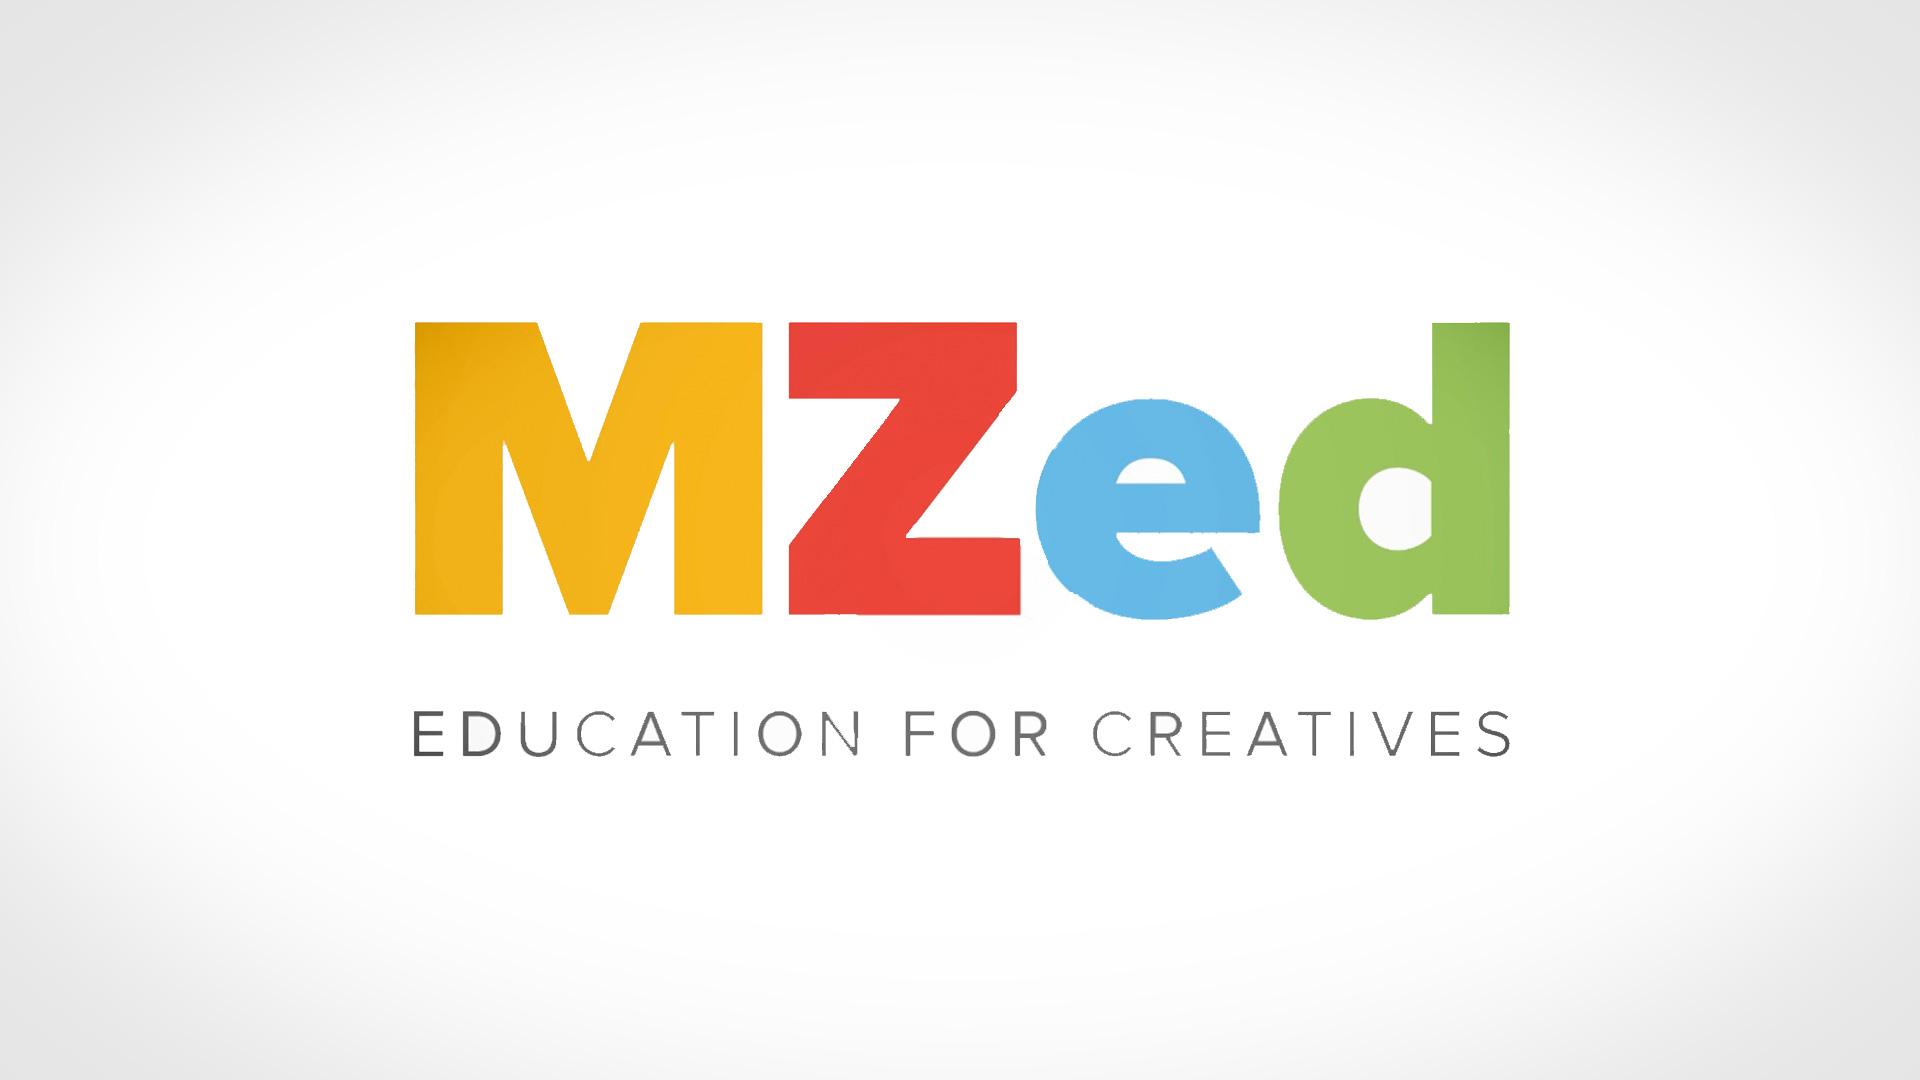 Oferta de fin de semana de MZed - Cursos de cine con descuento